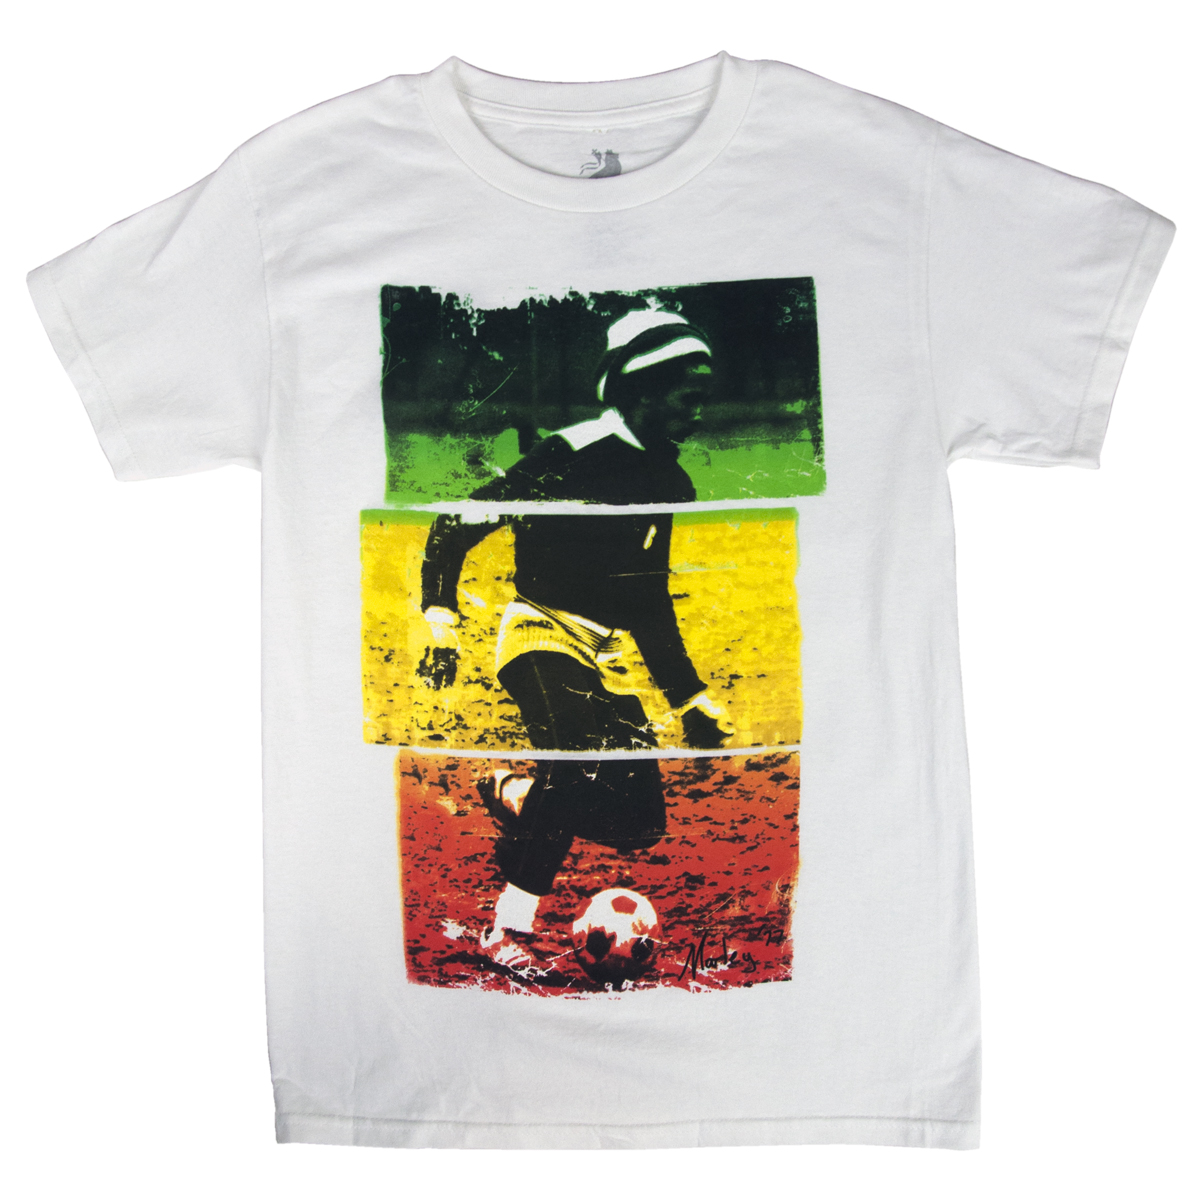 Bob marley soccer 77 rasta tri color white t shirt men 39 s for Band t shirt designs for sale